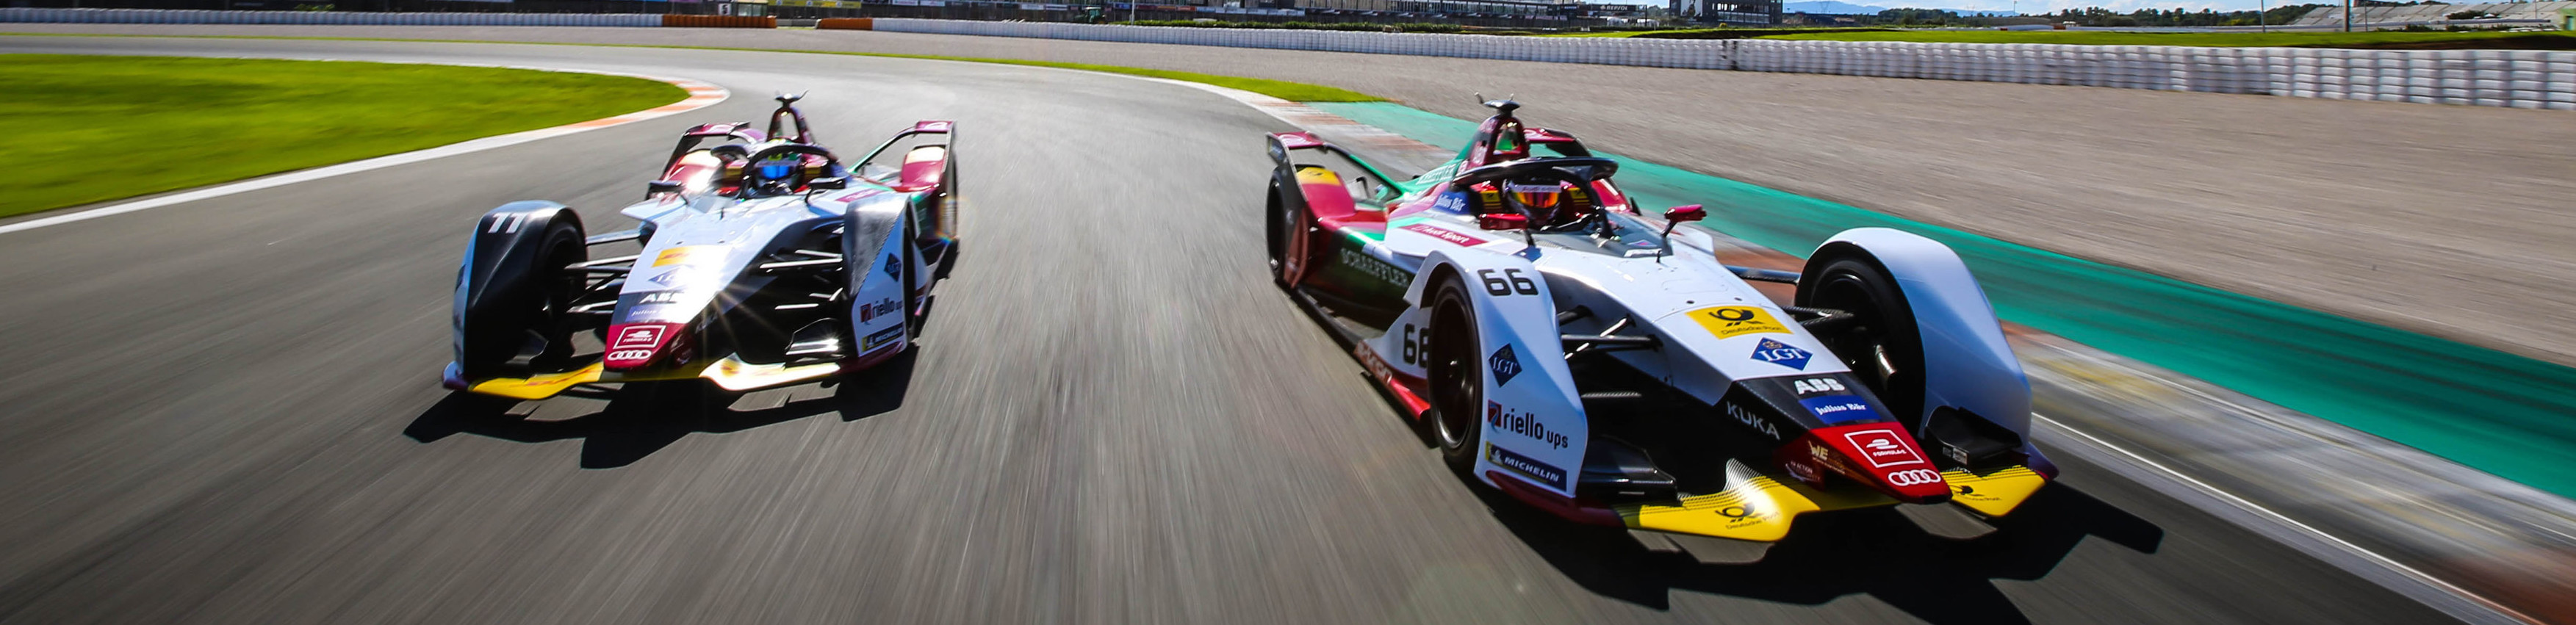 Audi Sport ABT Schaeffler con Daniel Abt y Lucas di Grassi estarán en la parrilla como defensores del título de Formula E